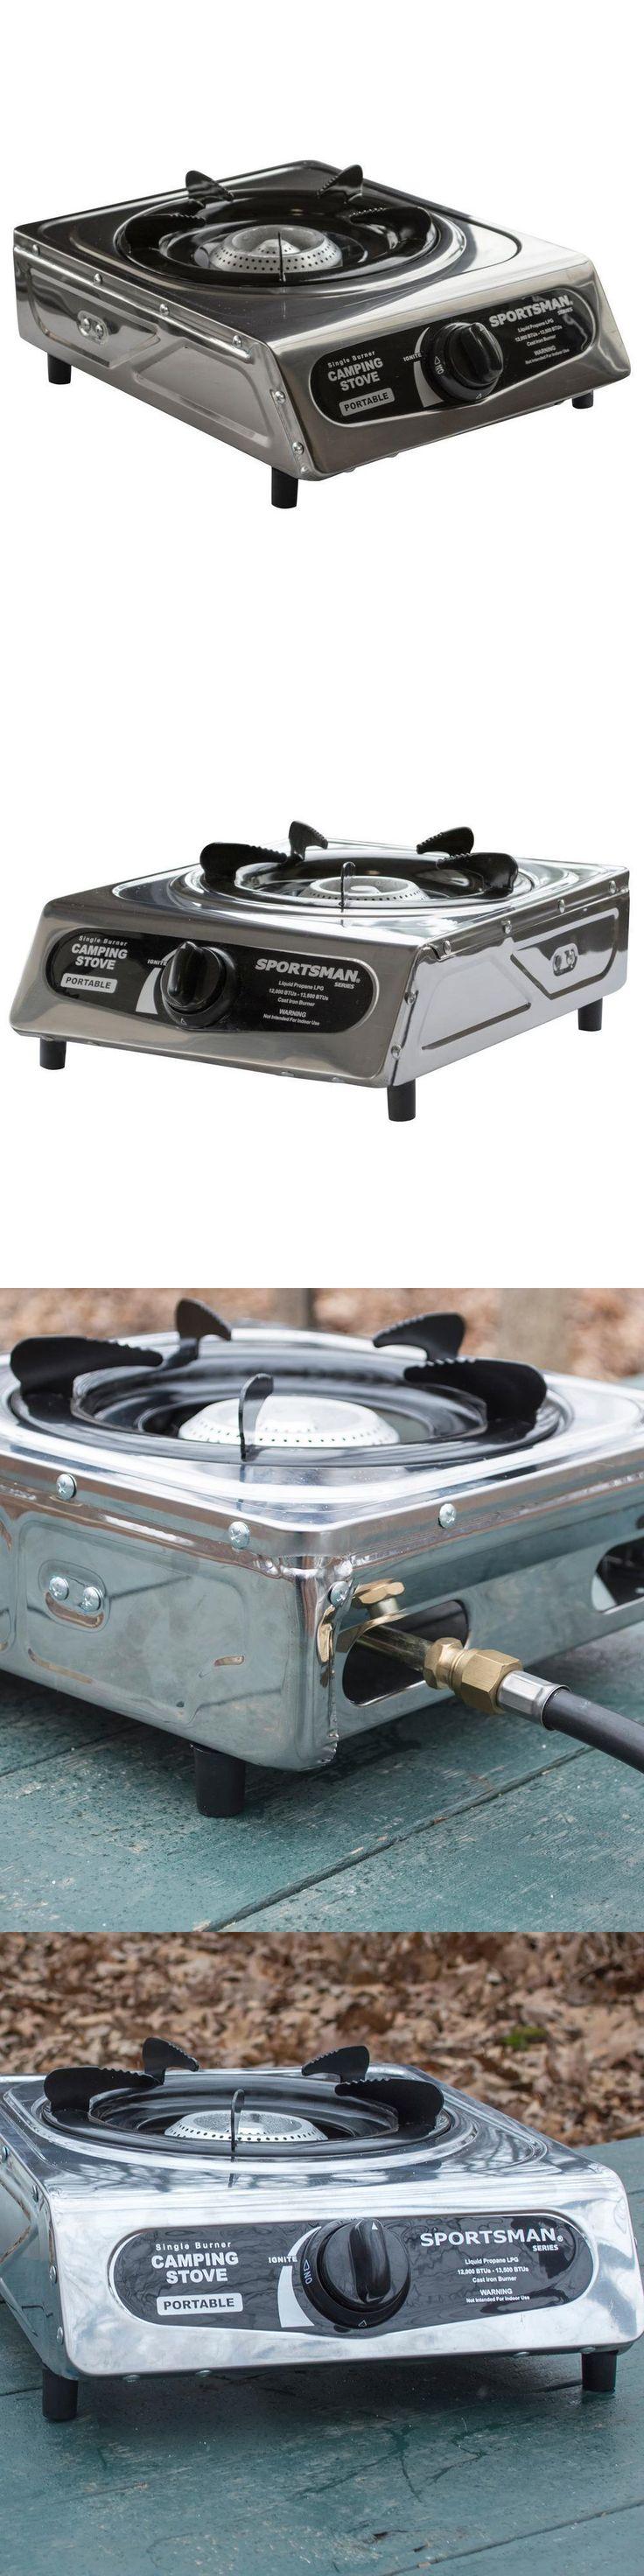 Best 25+ Portable gas stove ideas on Pinterest | Portable stove ...